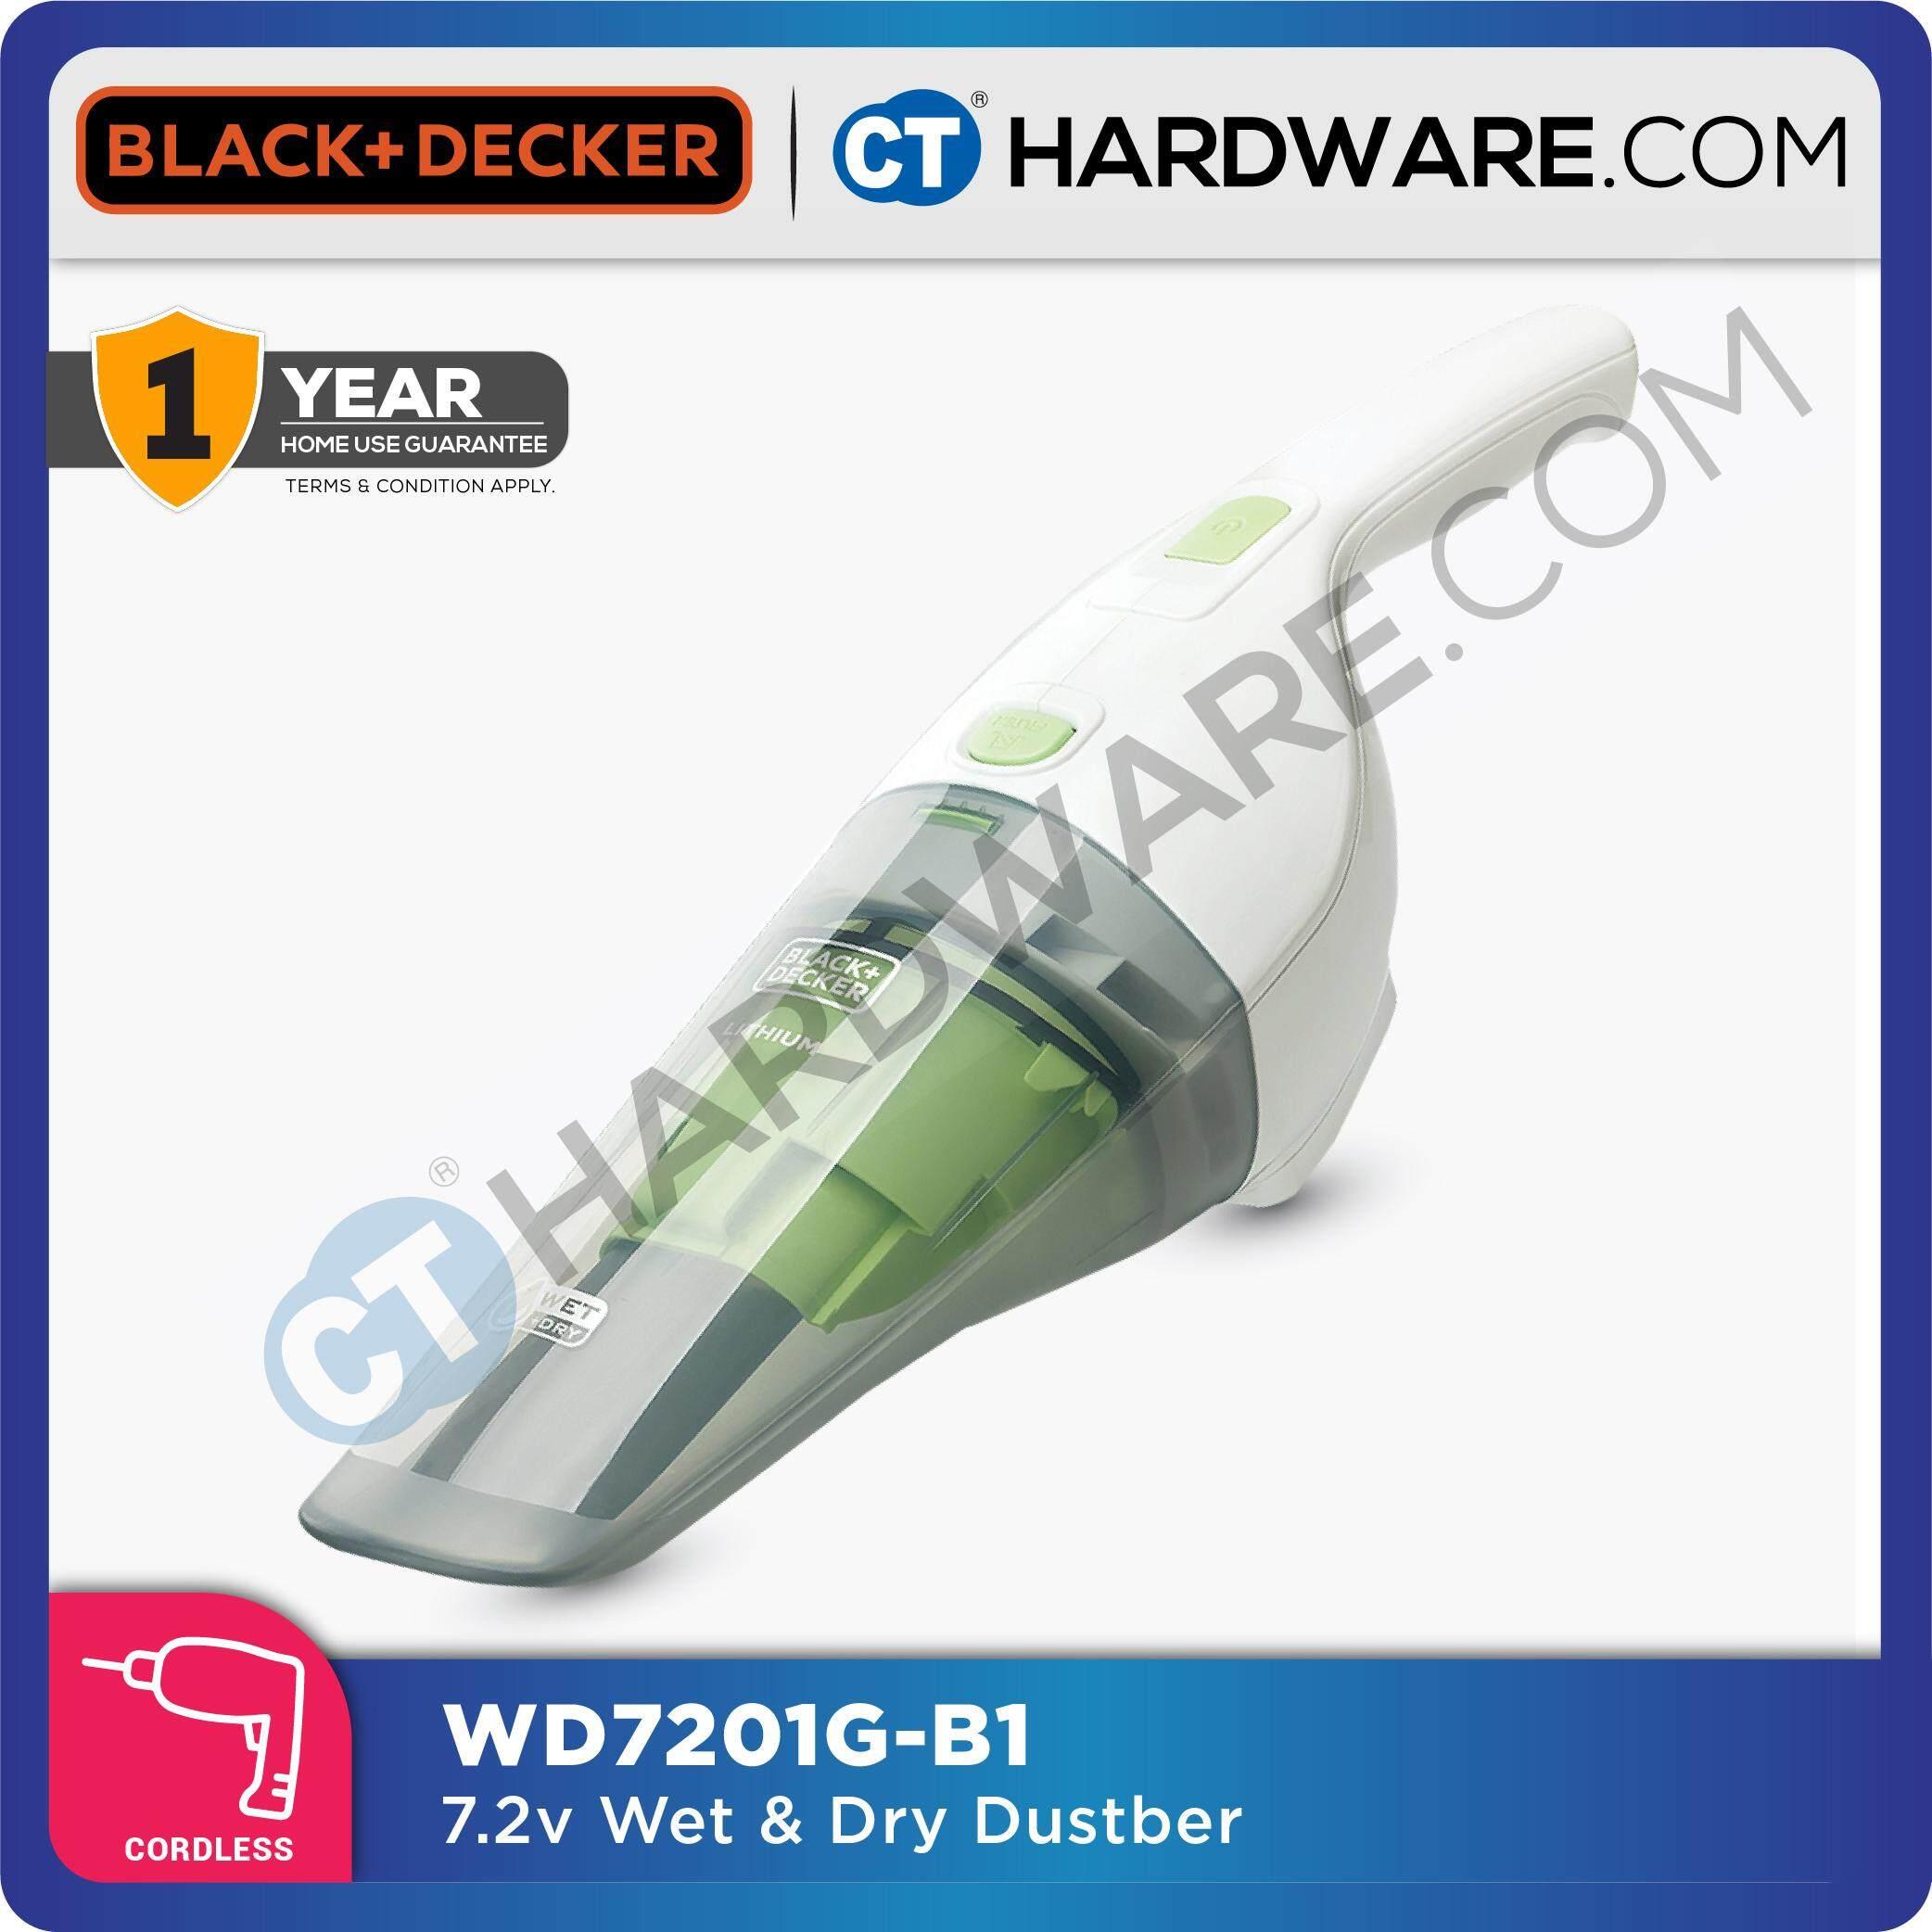 BLACK & DECKER WD7201 CORDLESS 7.2V WET & DRY HAND VACUUM